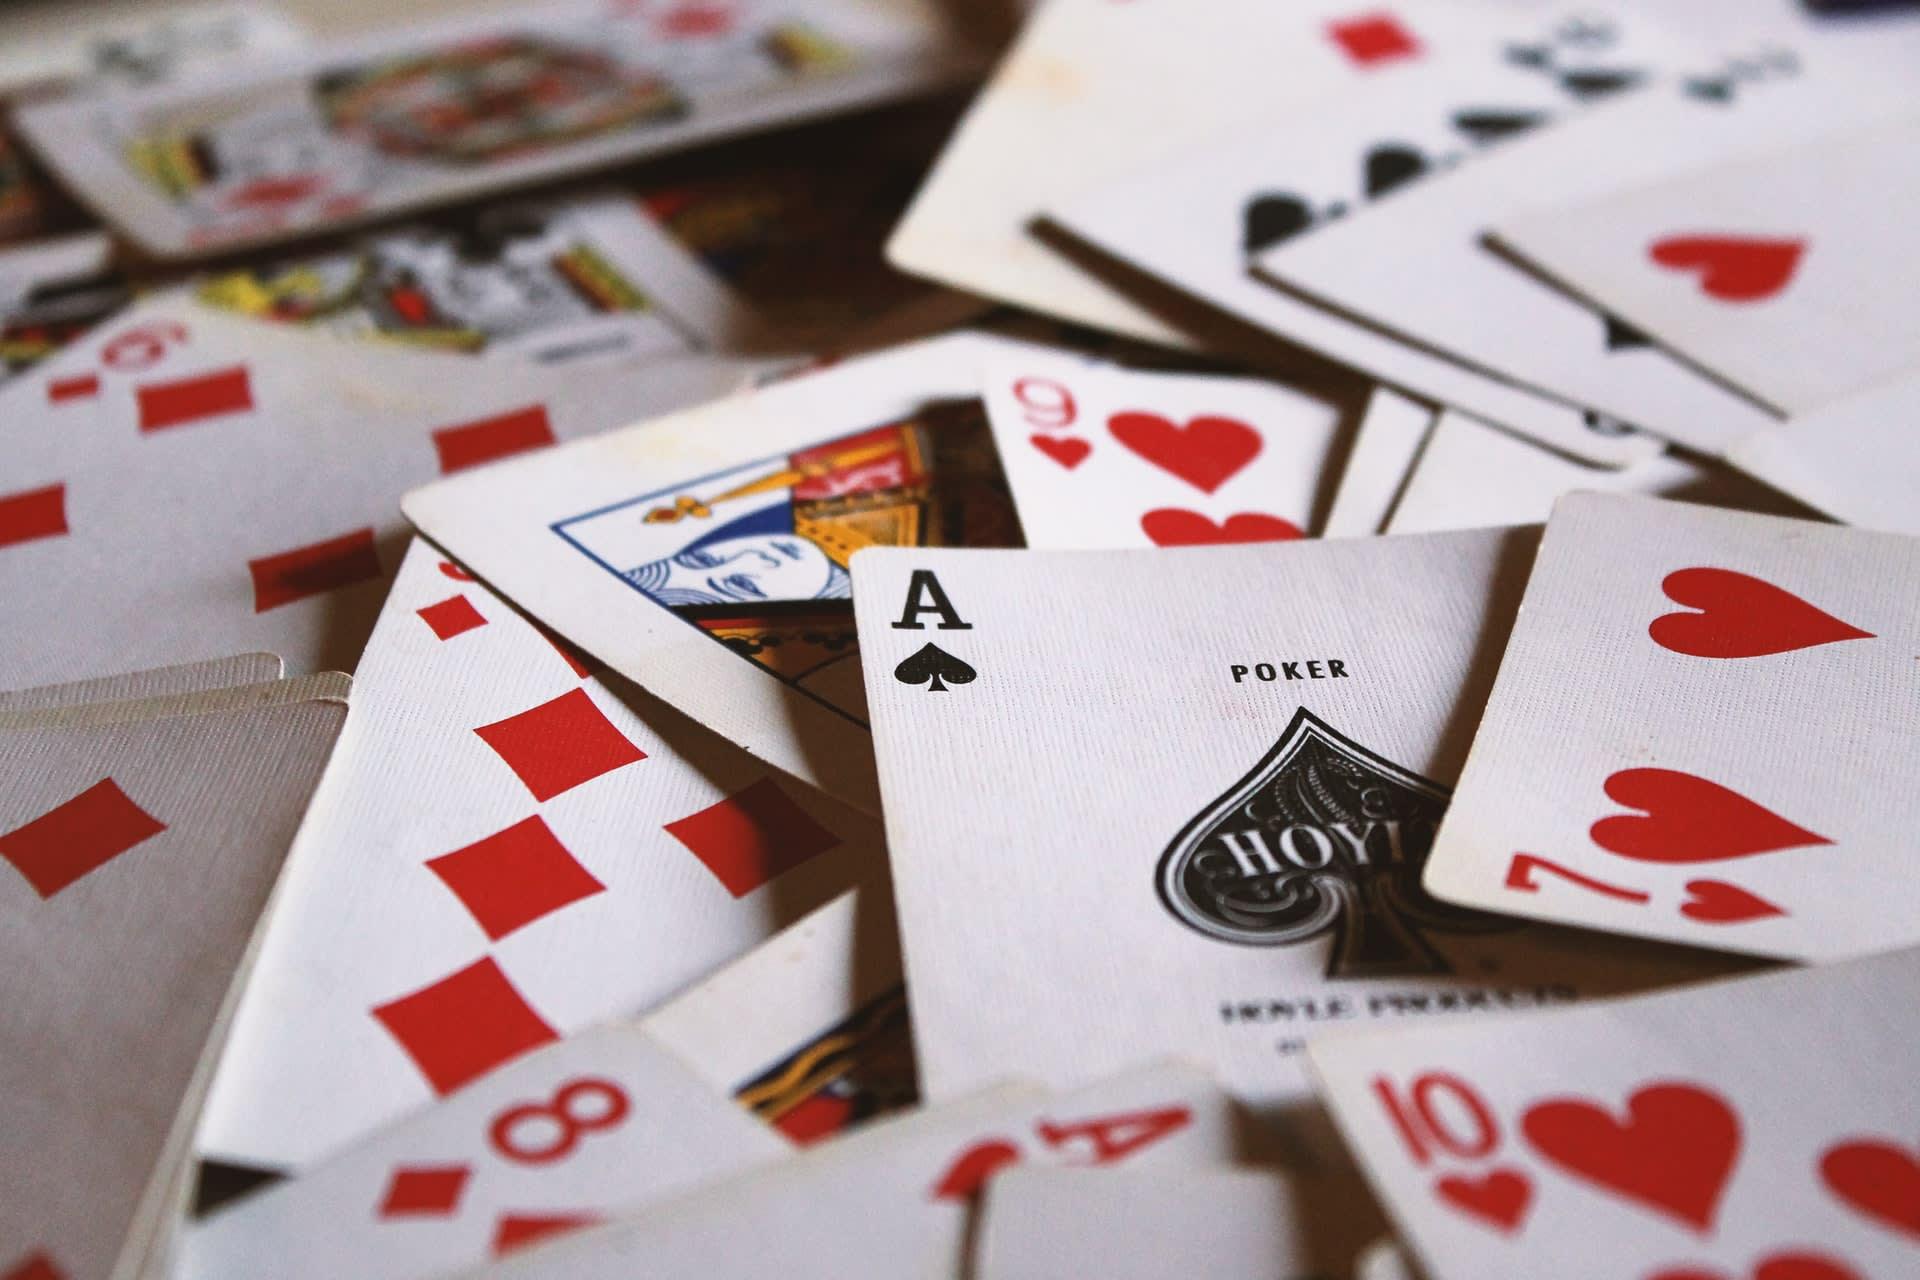 Tehnologia din spatele Live Casino și Live Blackjack